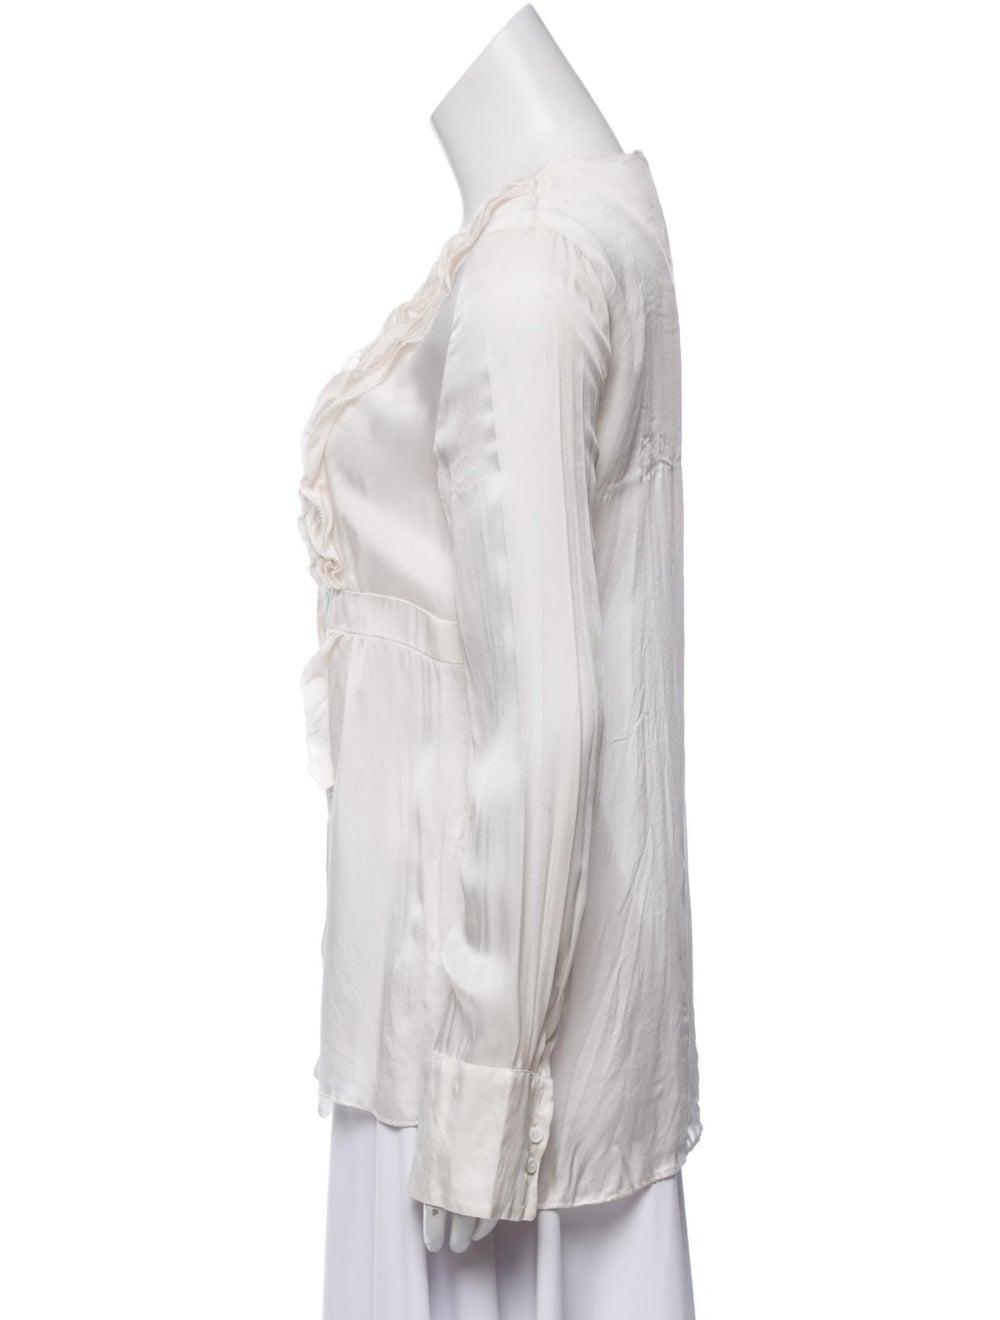 Givenchy Silk Long Sleeve Blouse - image 2